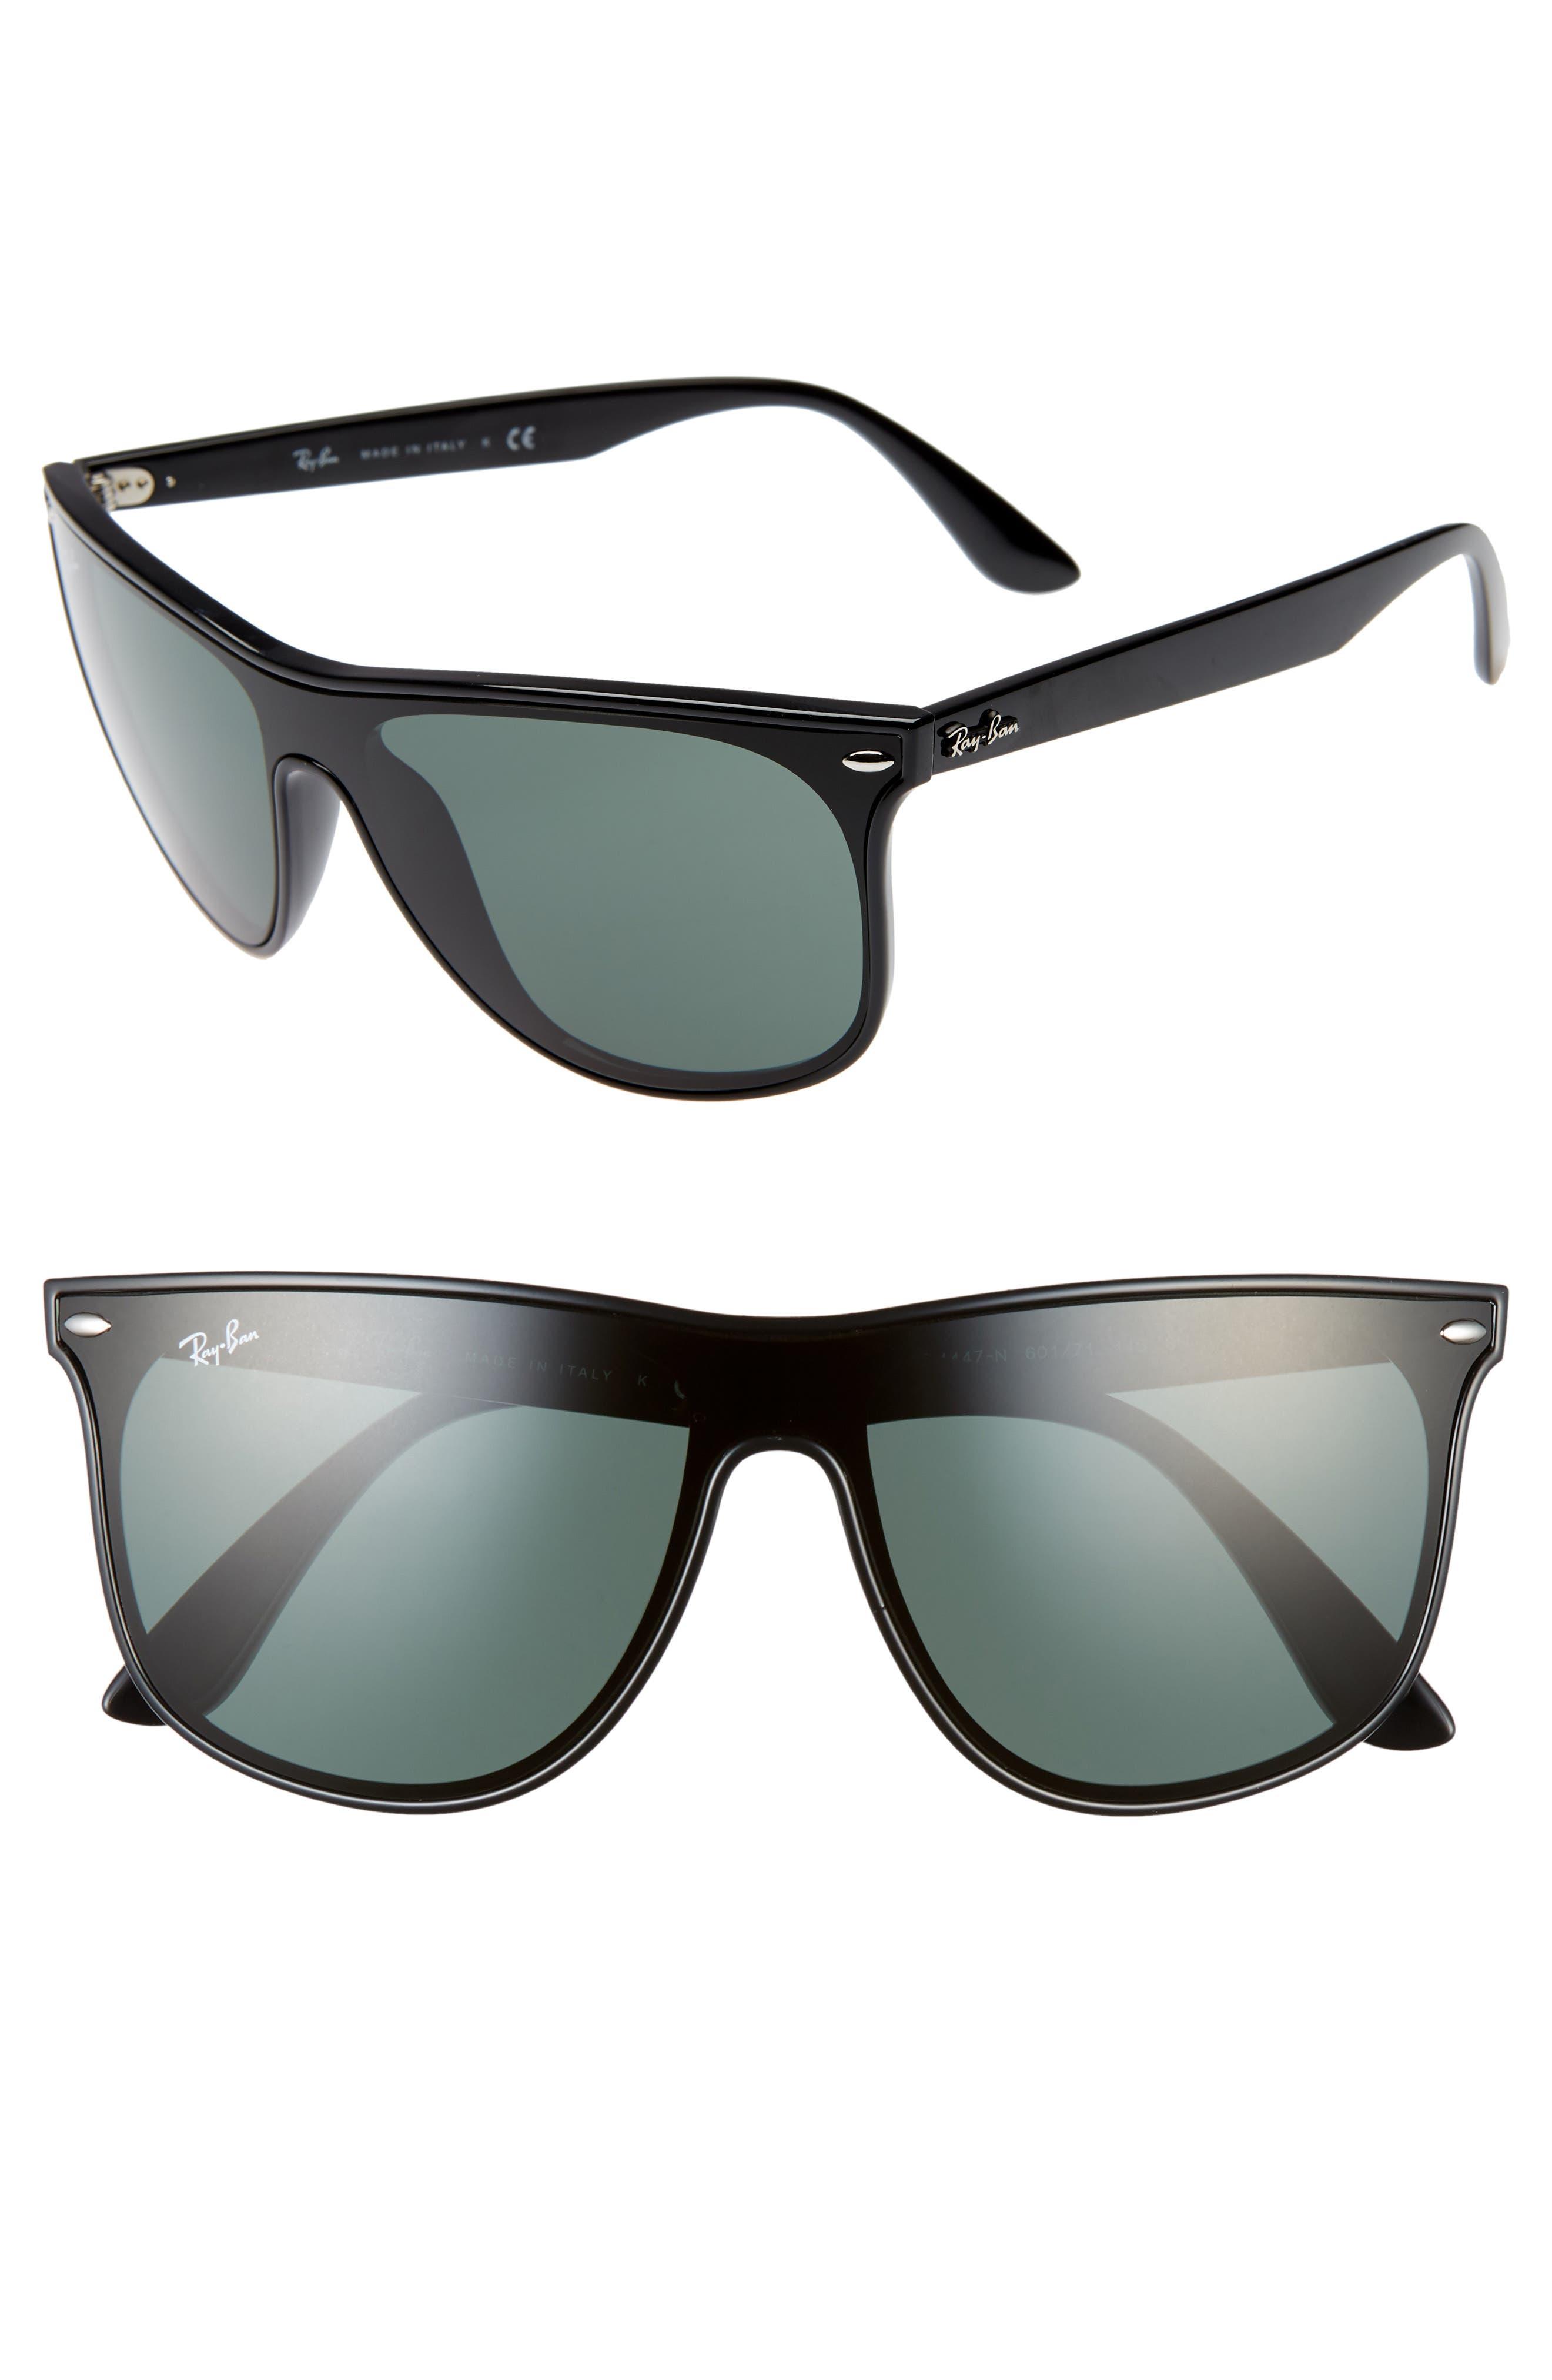 Ray-Ban Blaze 55Mm Sunglasses - Black